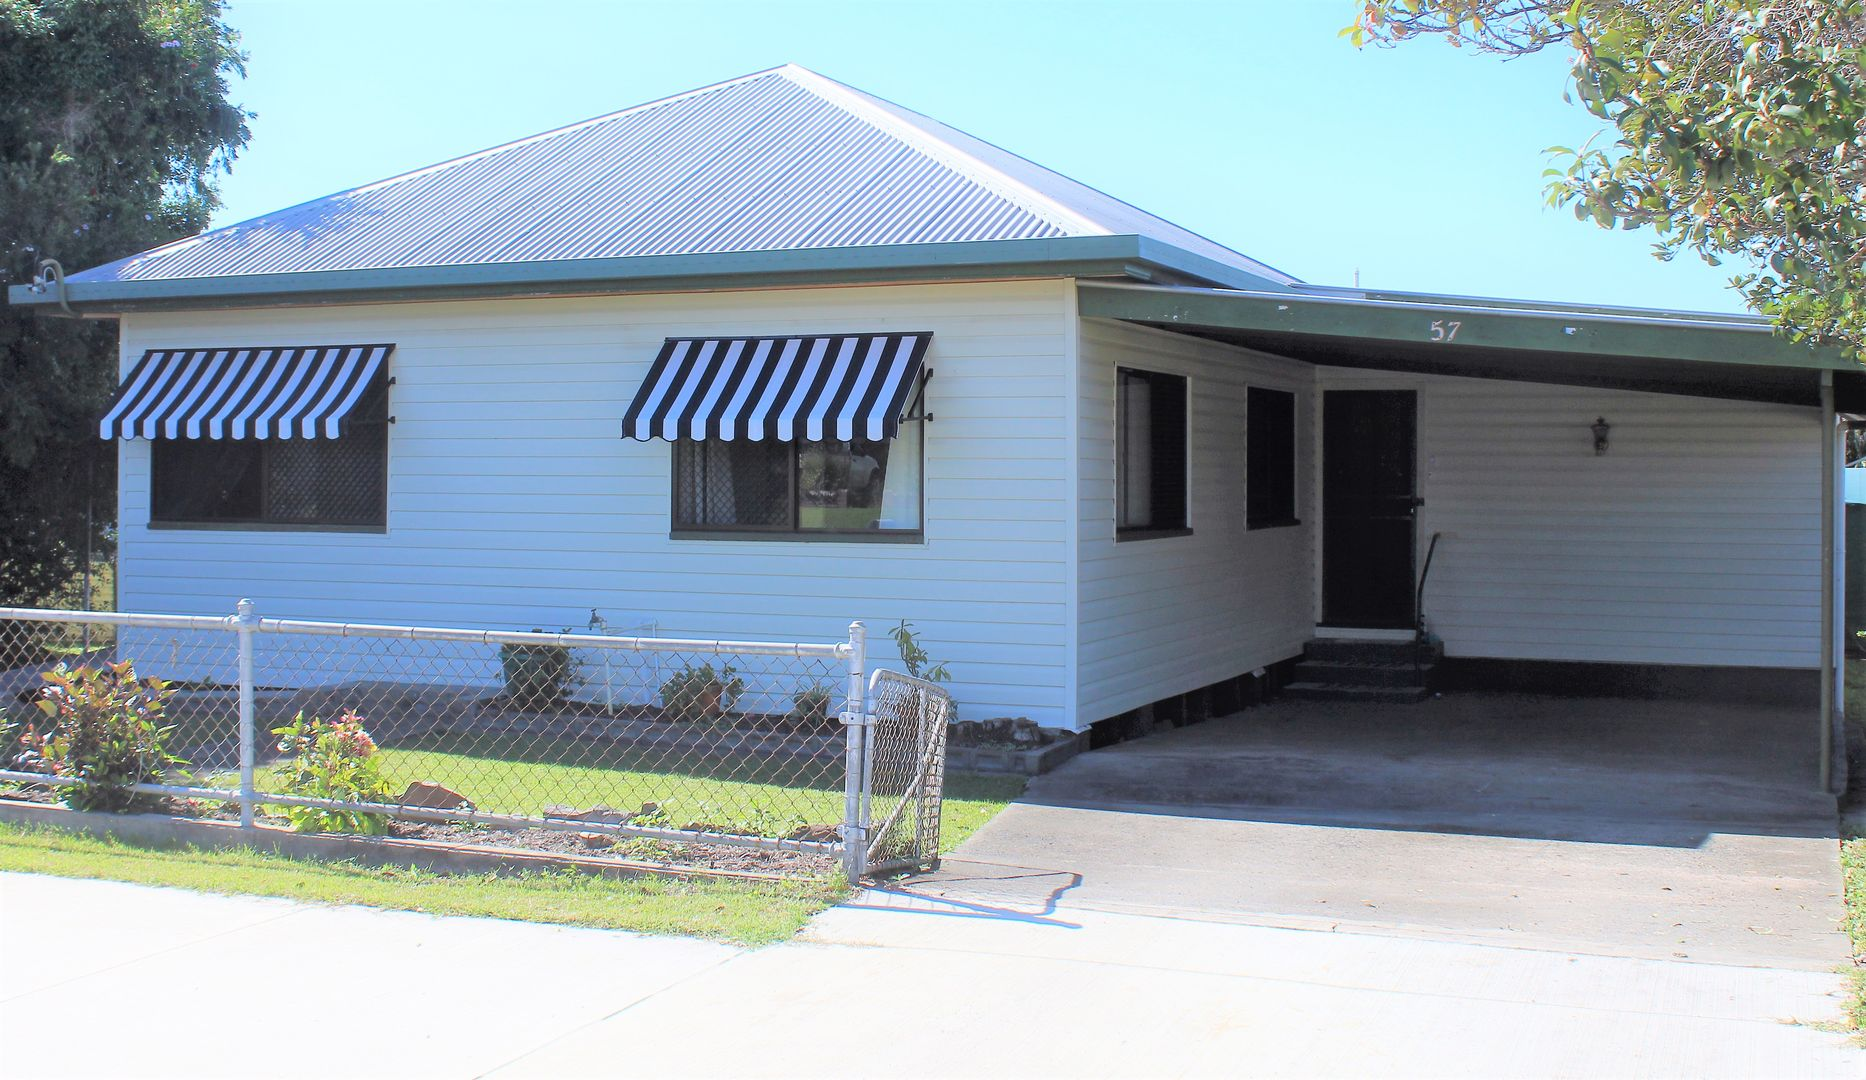 57 Centre Street, Casino NSW 2470, Image 0